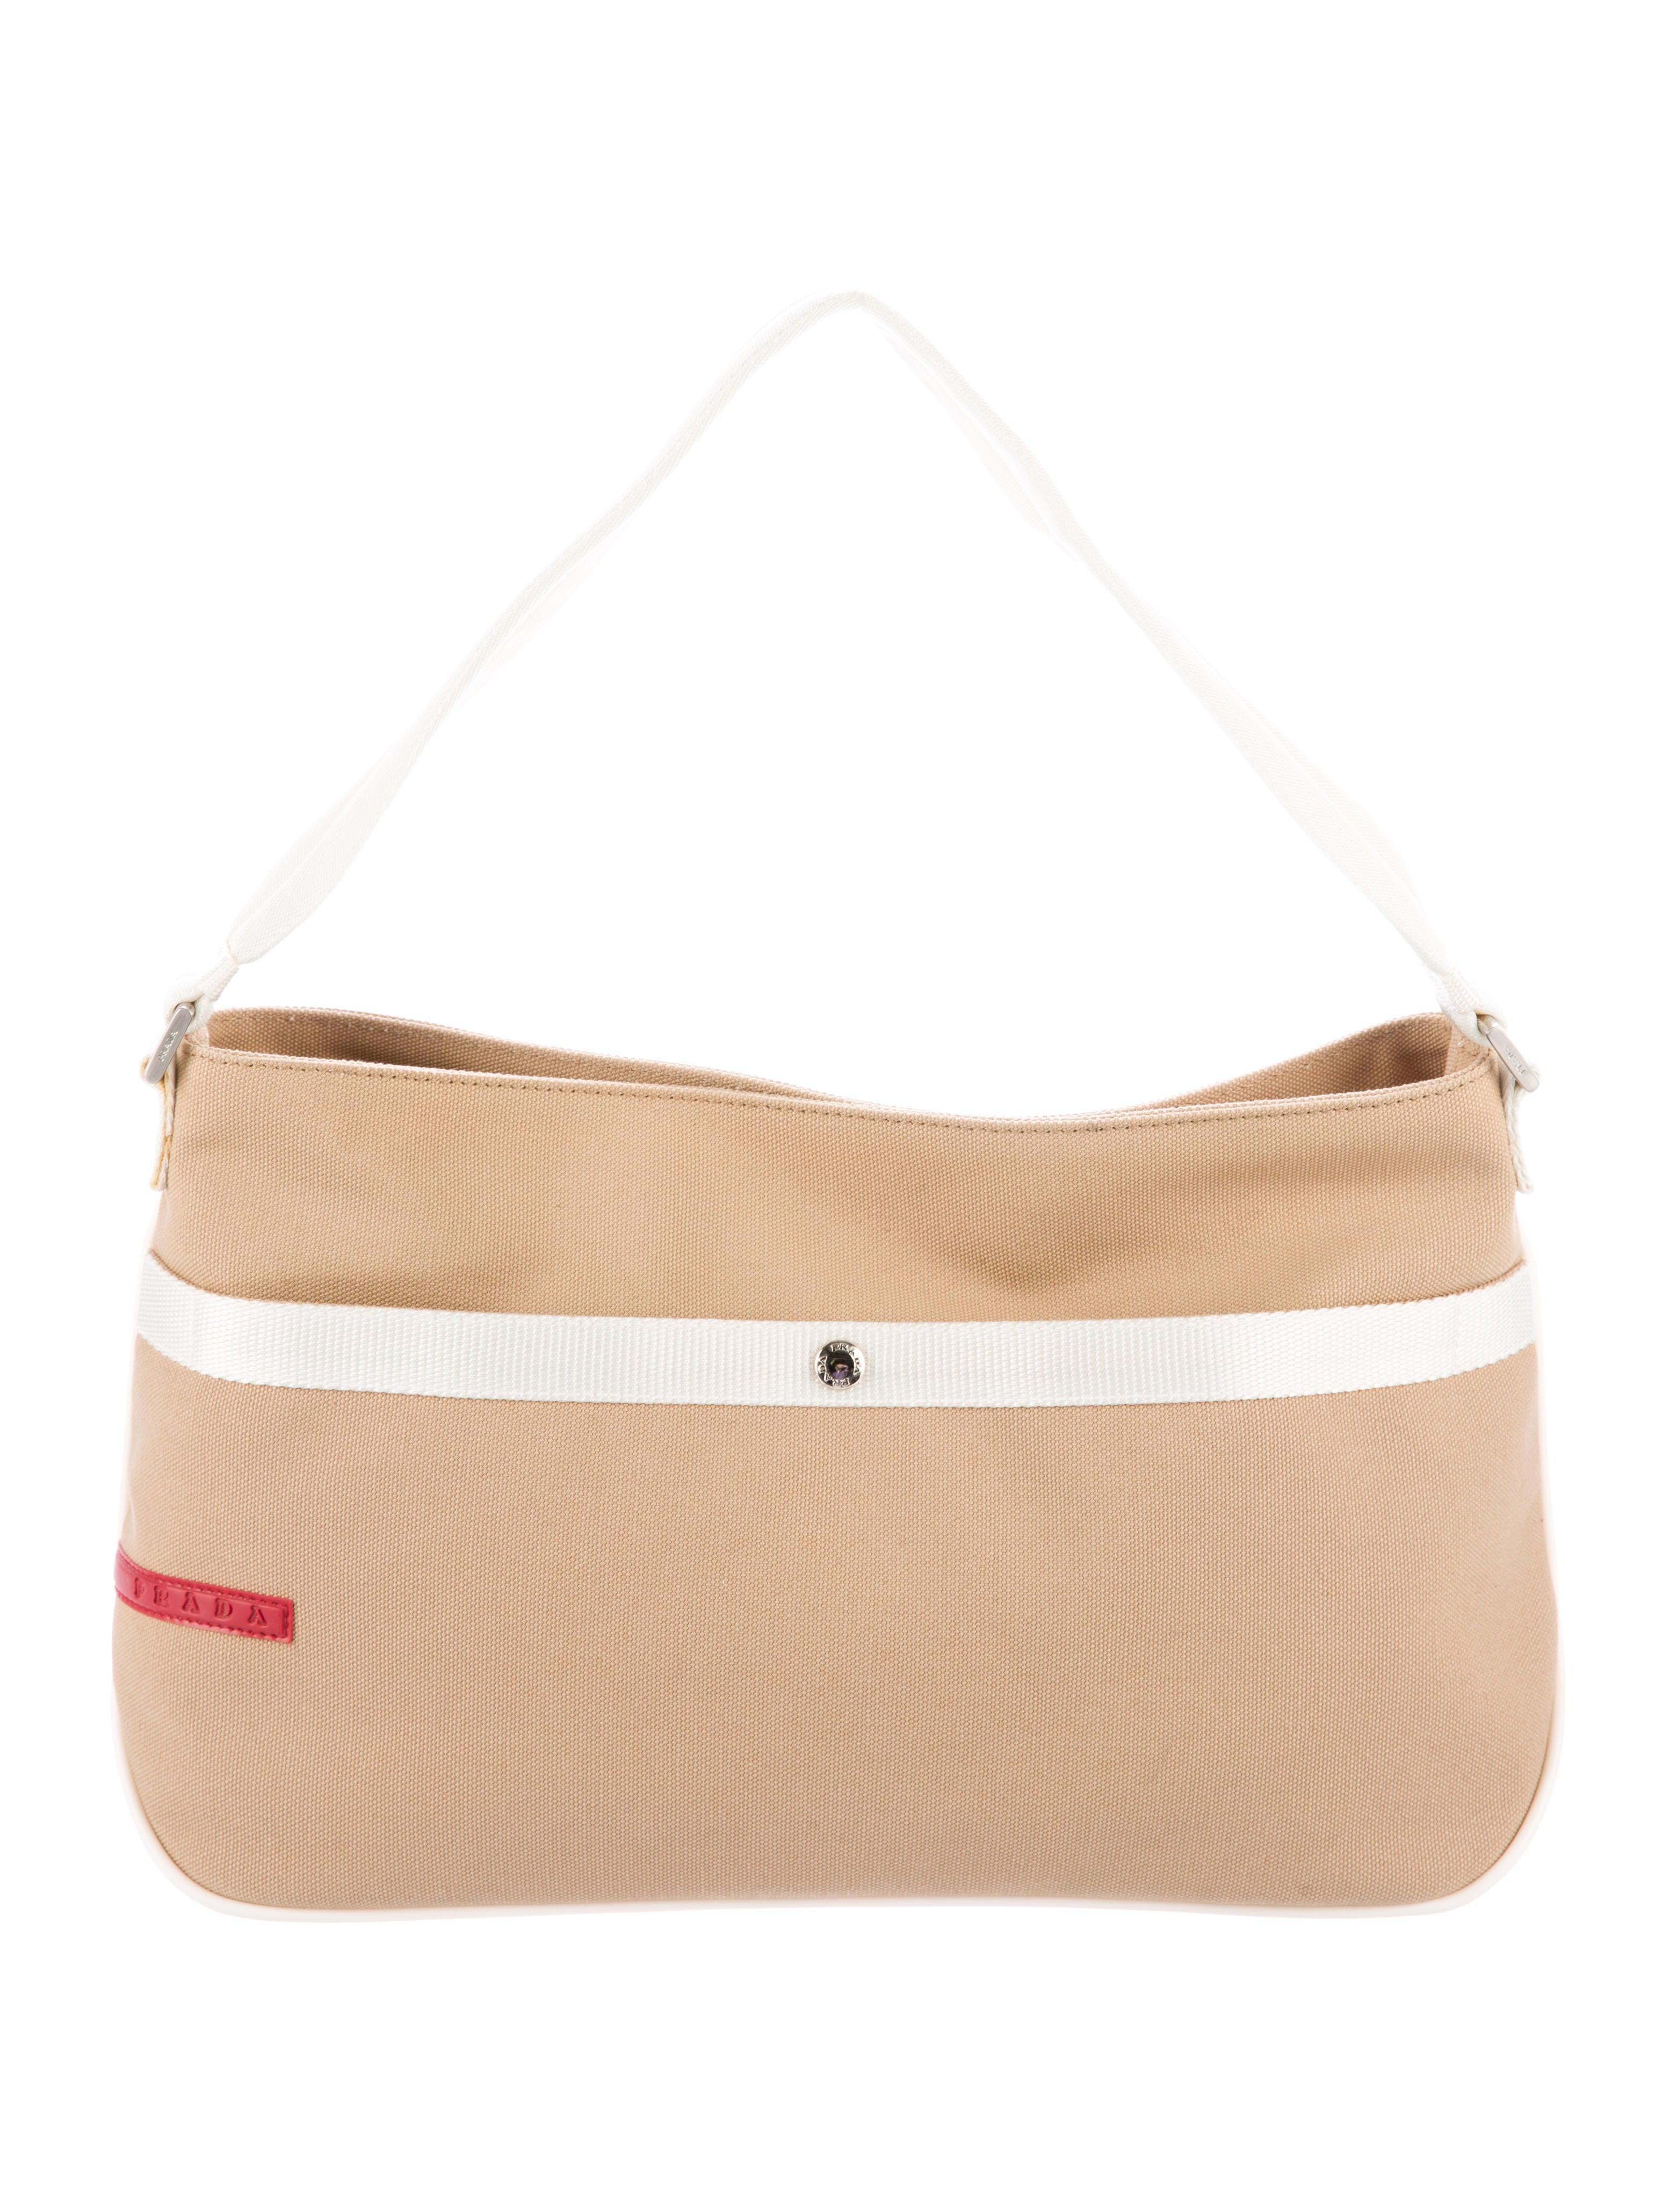 e9de376e5dfe Prada Sport Colorblock Canapa Shoulder Bag - Handbags - WPR38033 ...